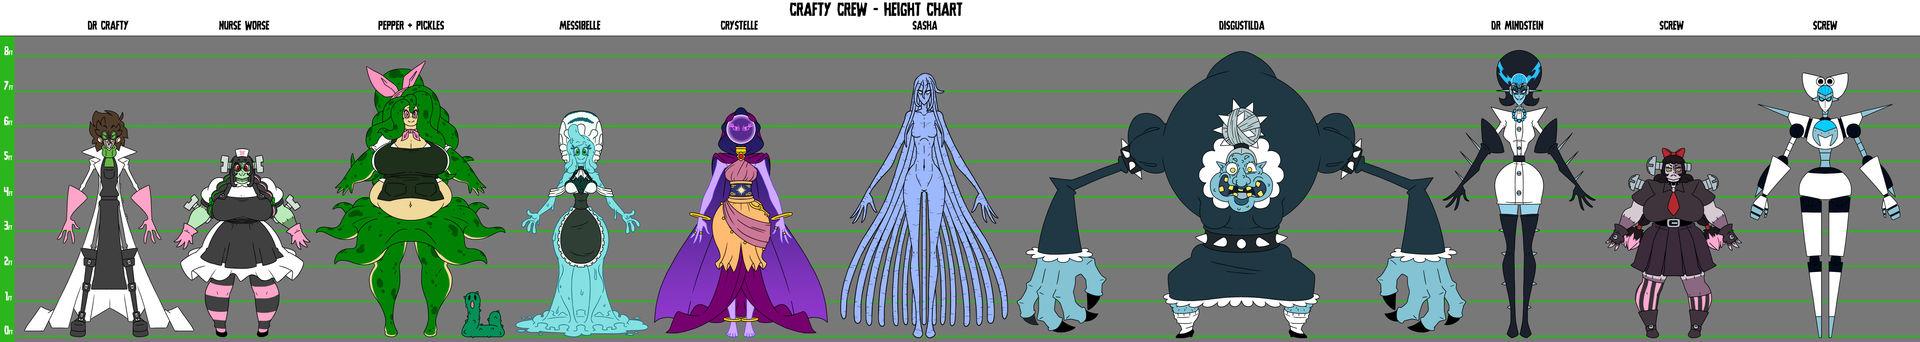 Crafty Concoction: Crafty Crew Hight Chart